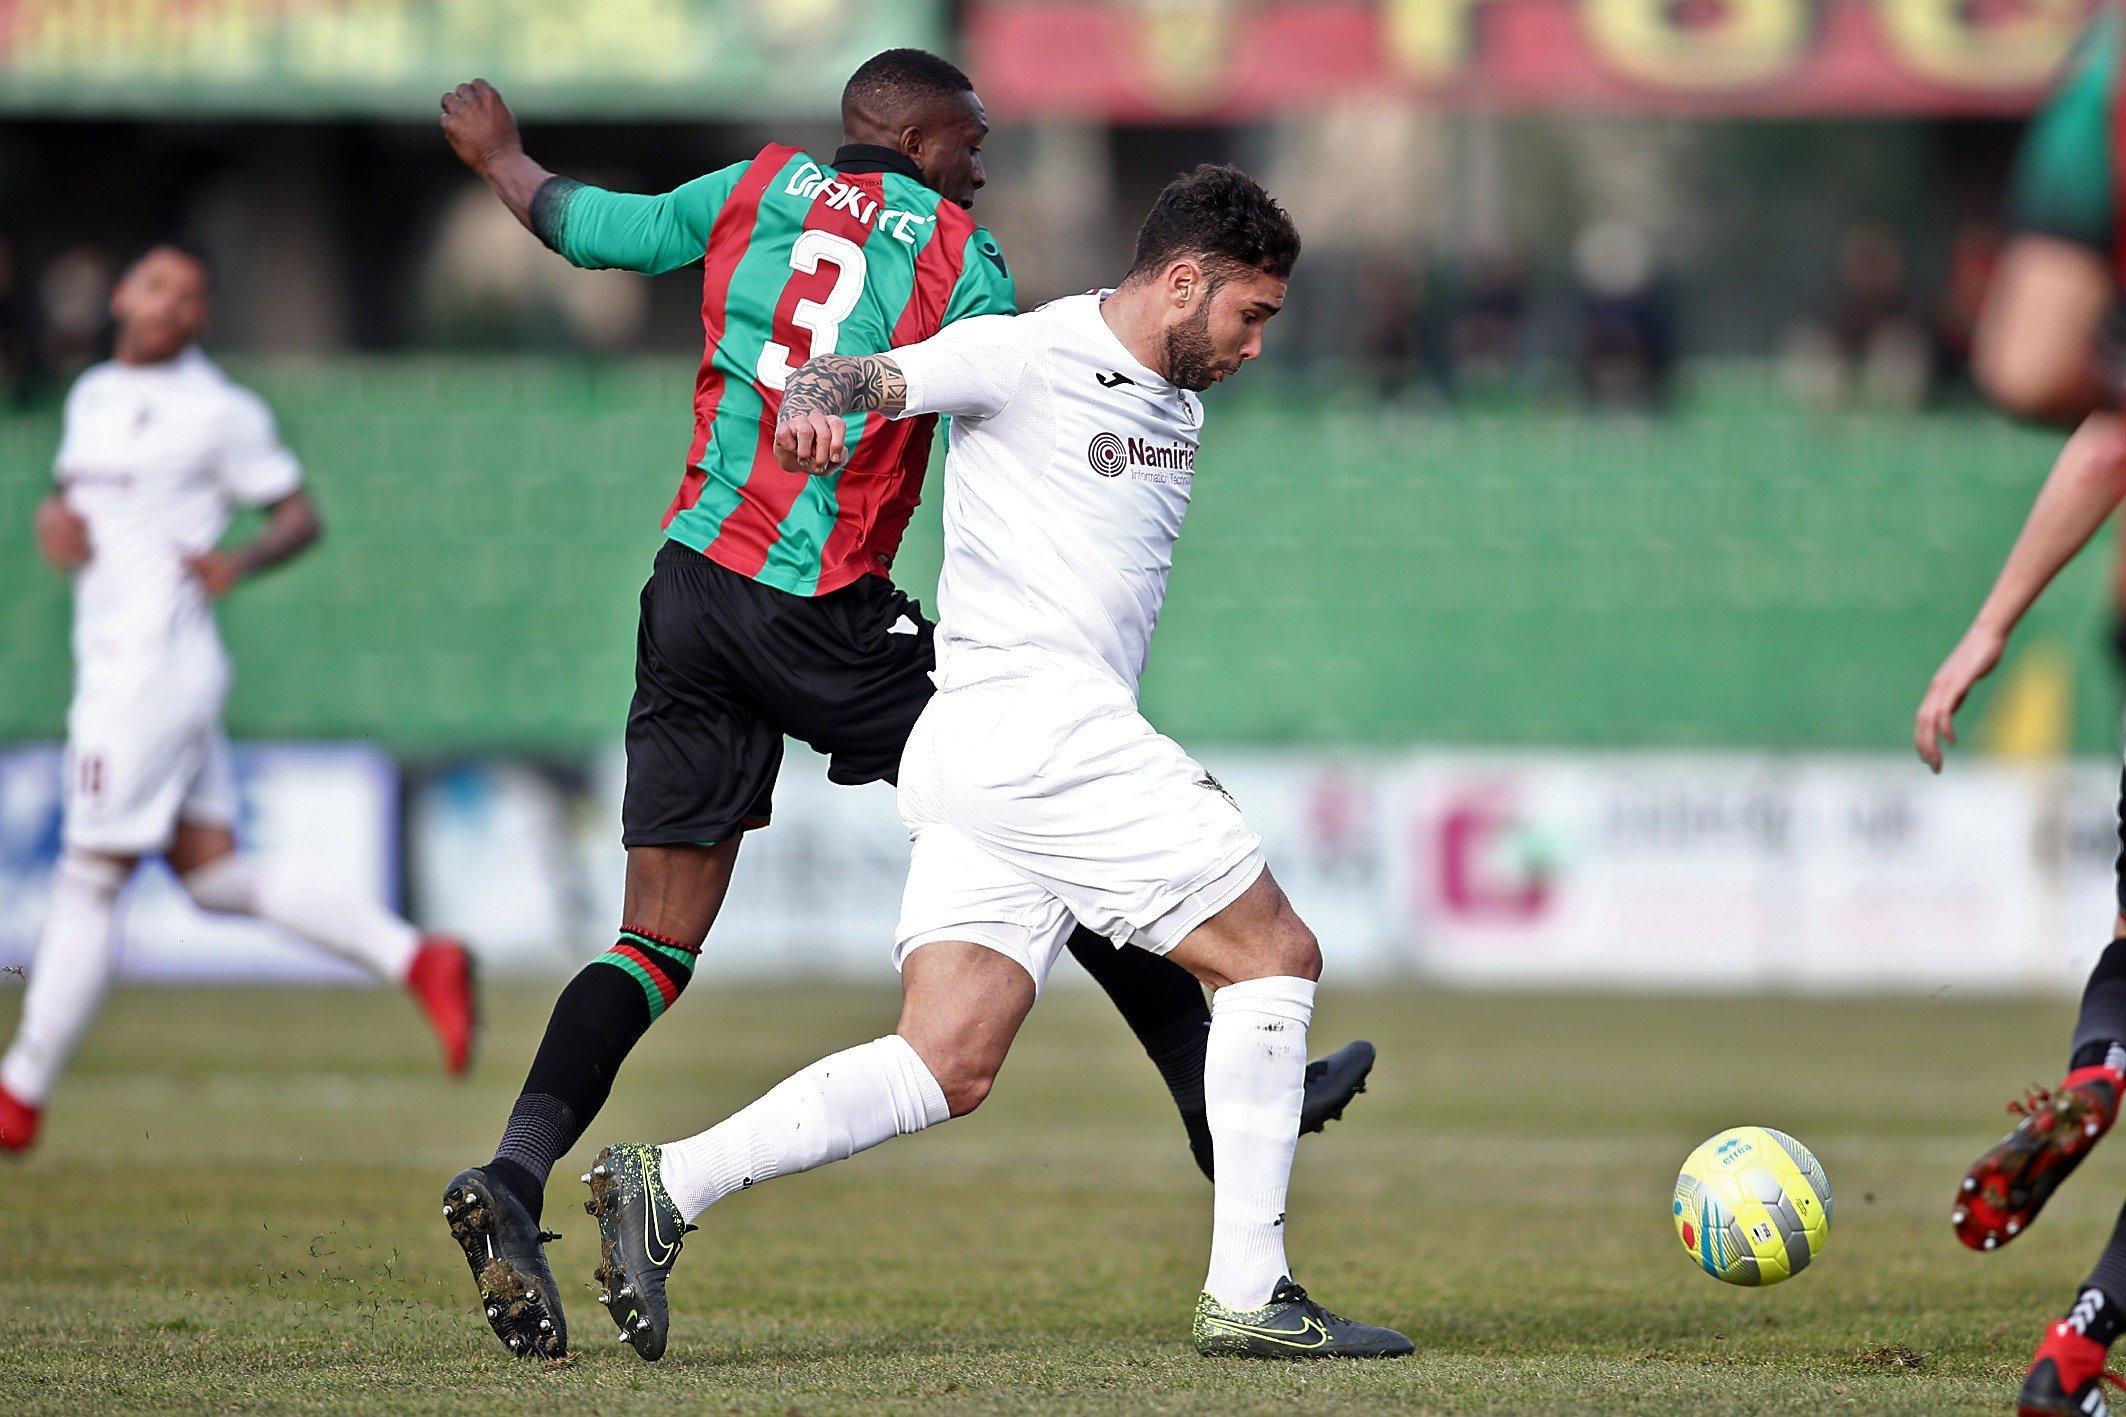 Lega Pro Ternana-Vis Pesaro, le probabili formazioni